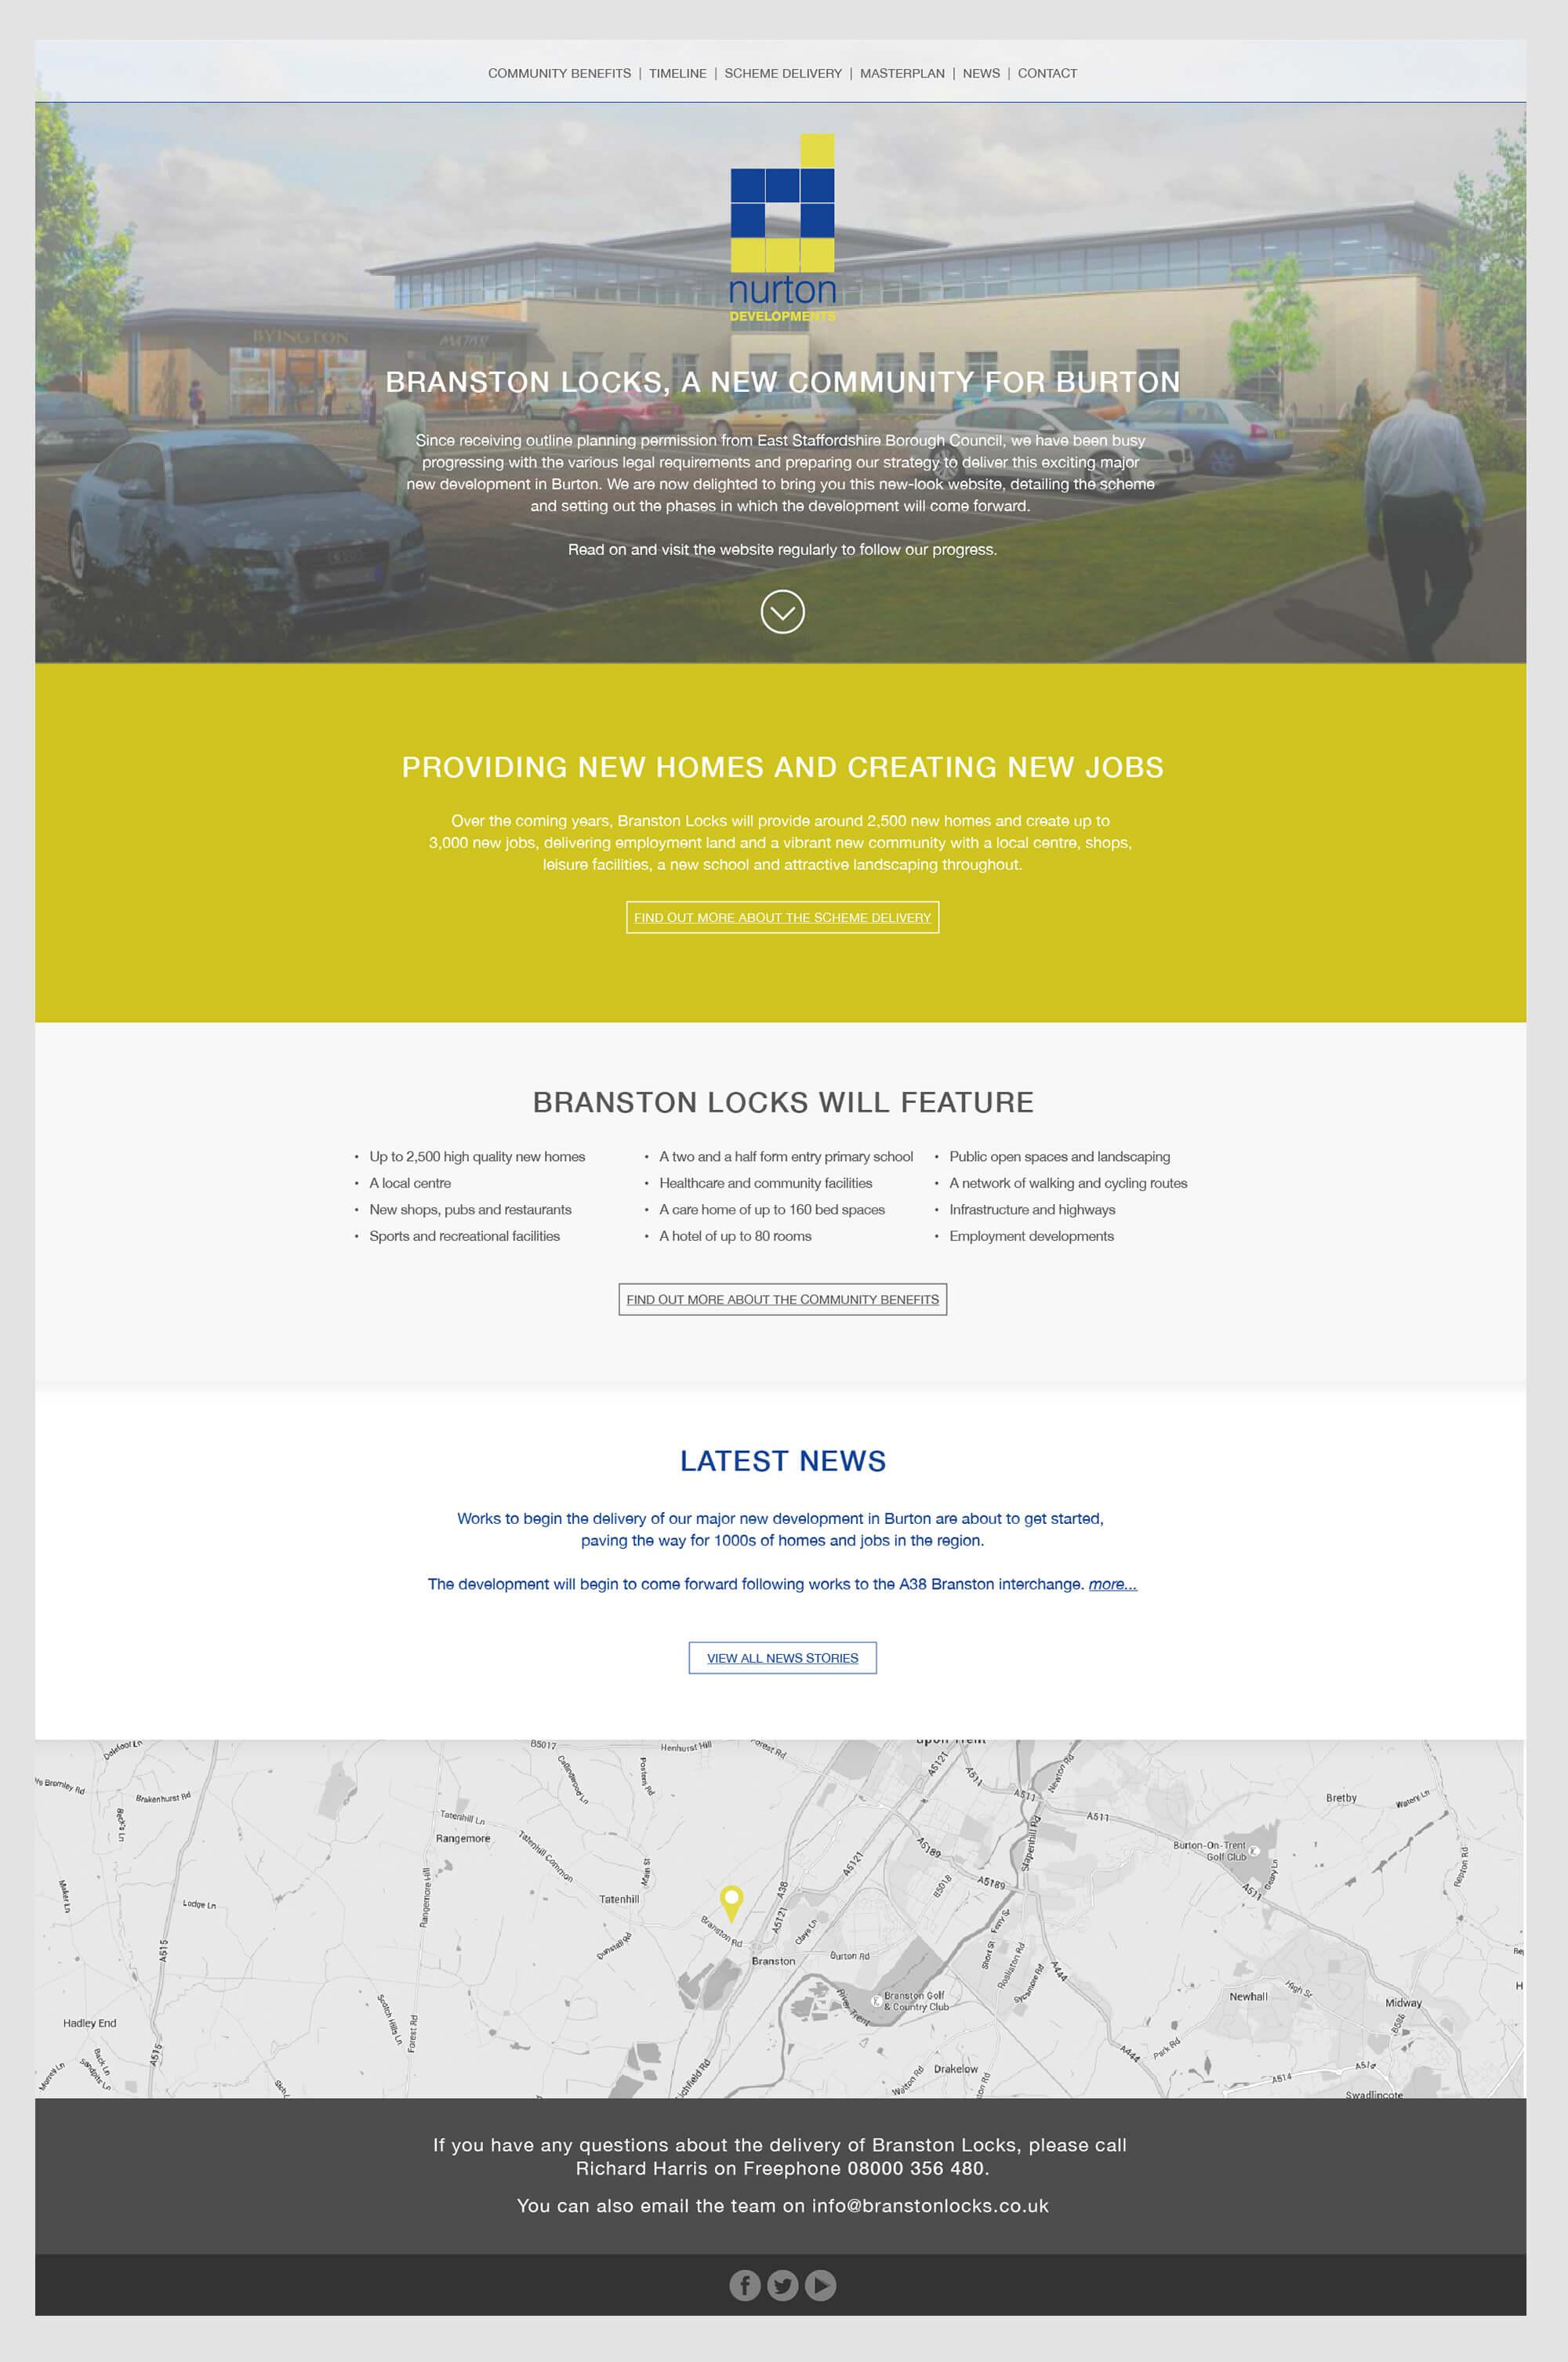 Branston Locks Website Design